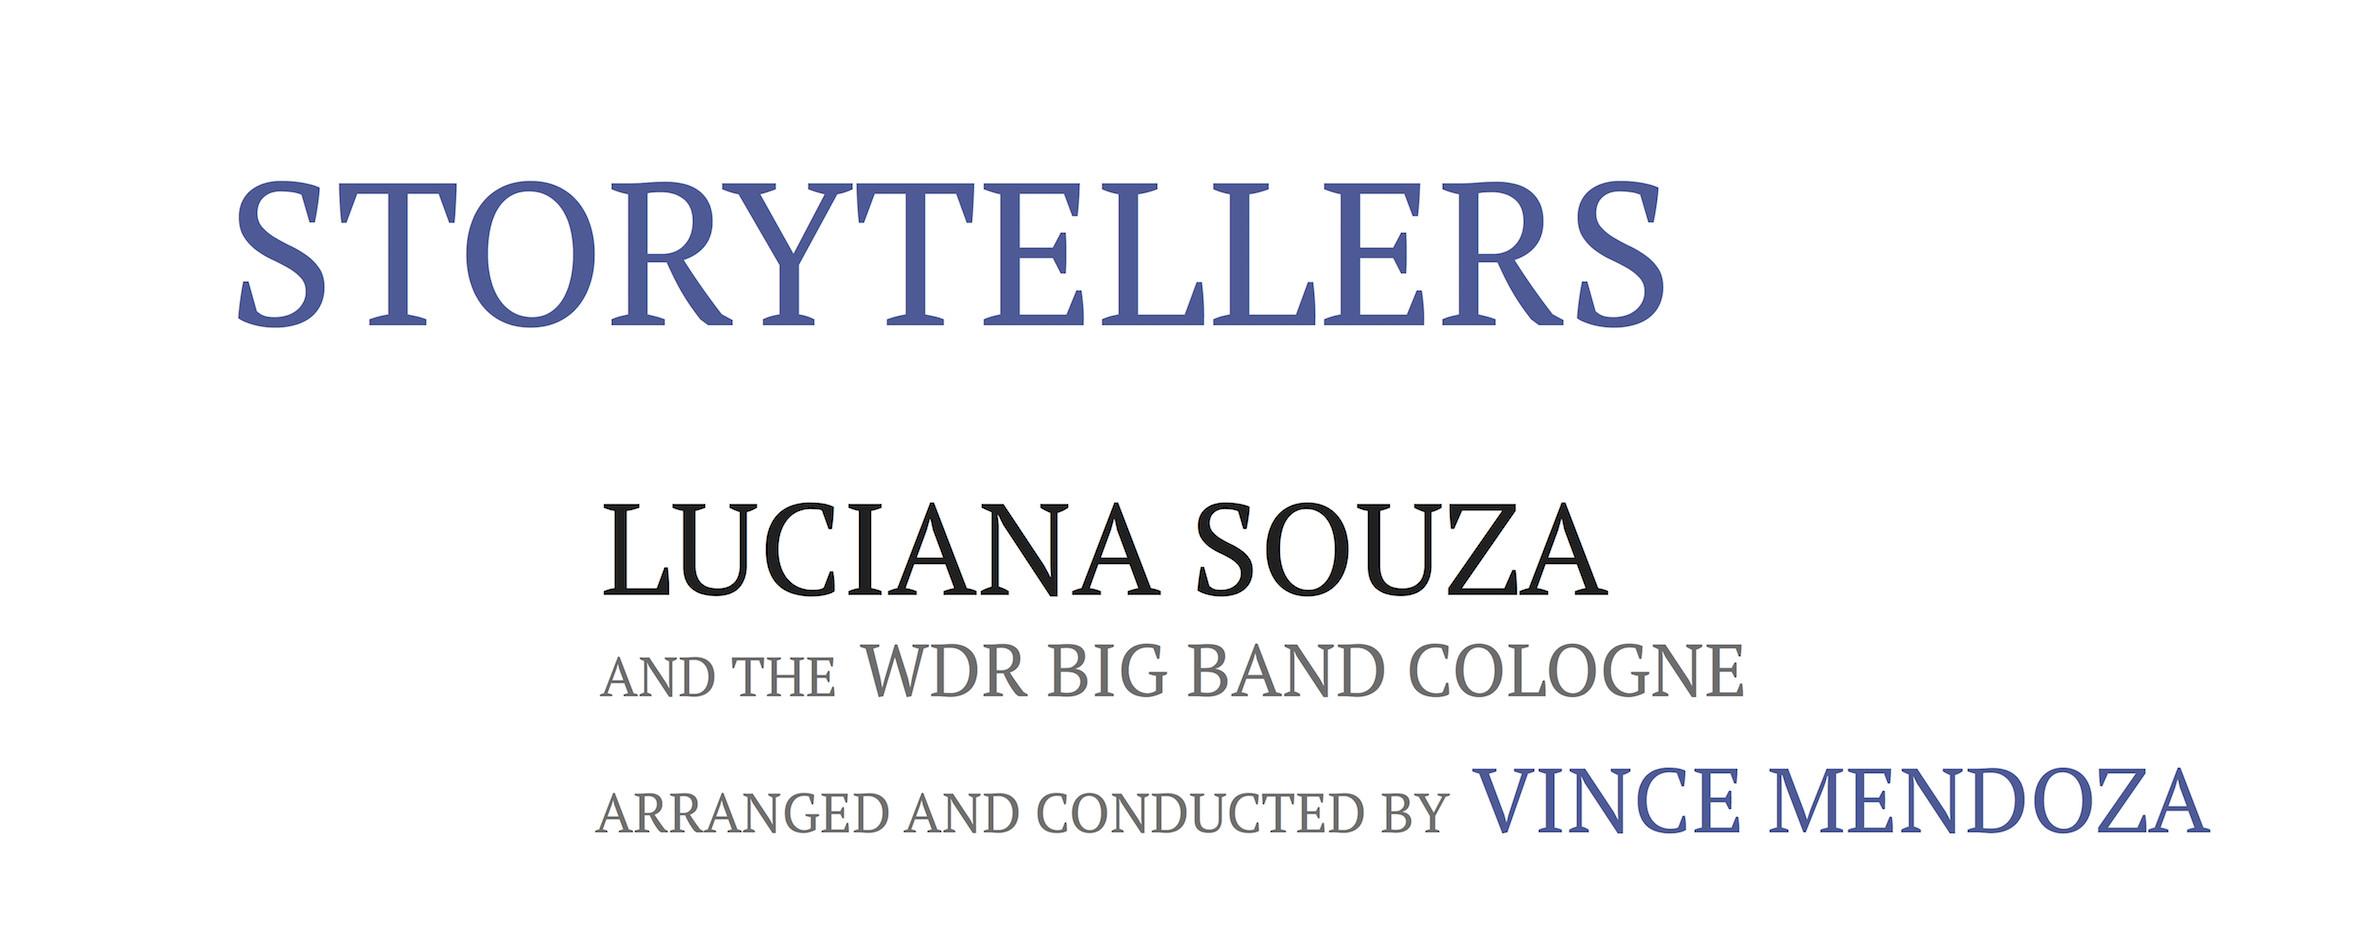 Luciana Souza Storytellers ロゴ.jpg